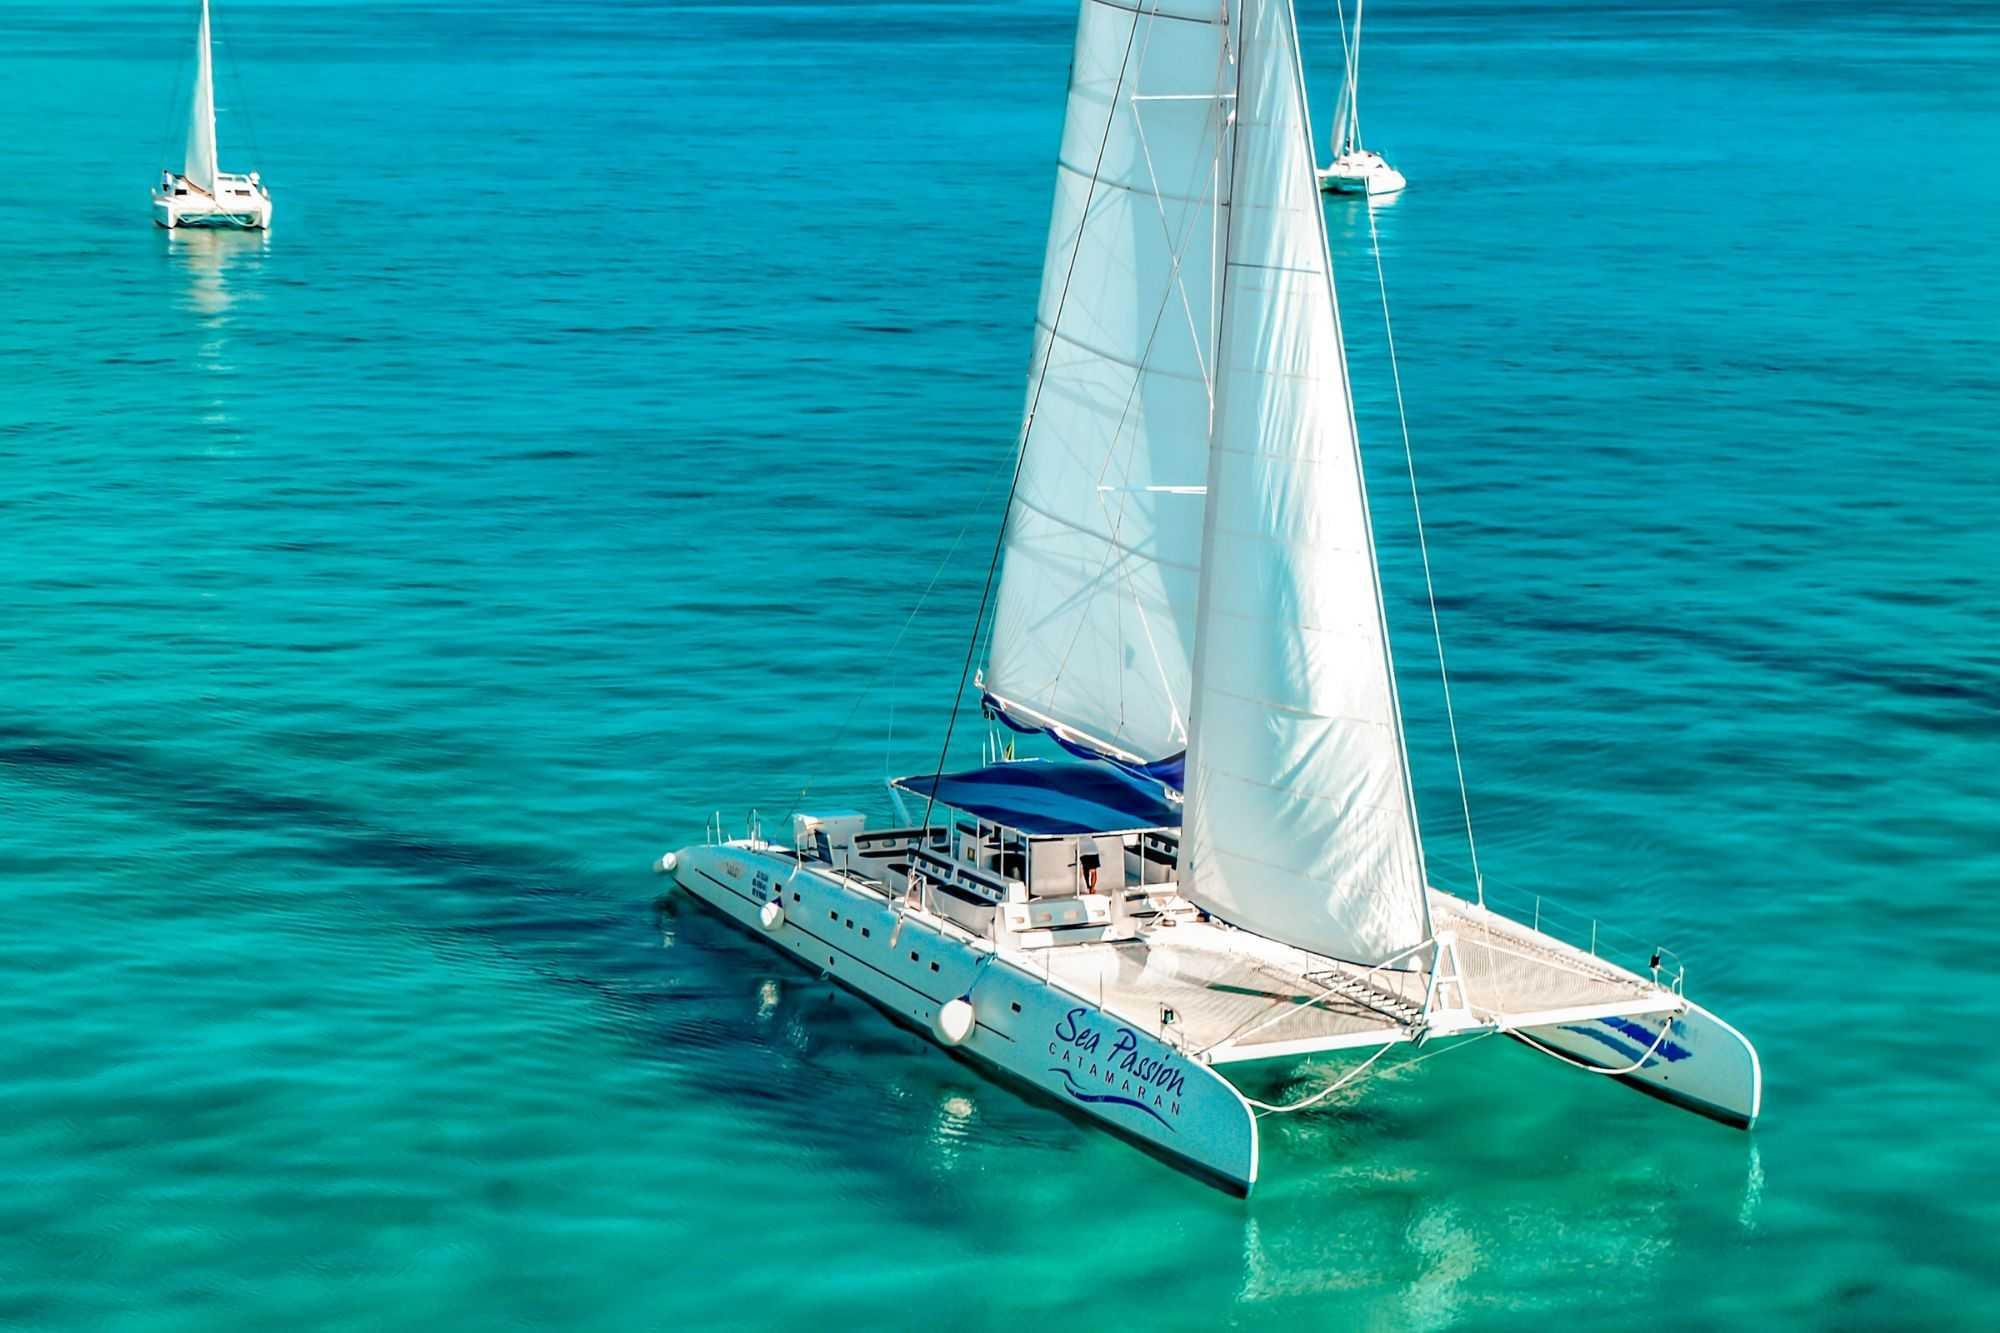 2 Private Isla Mujeres tour in catamaran - Sea Passion I II - Cancun Sailing